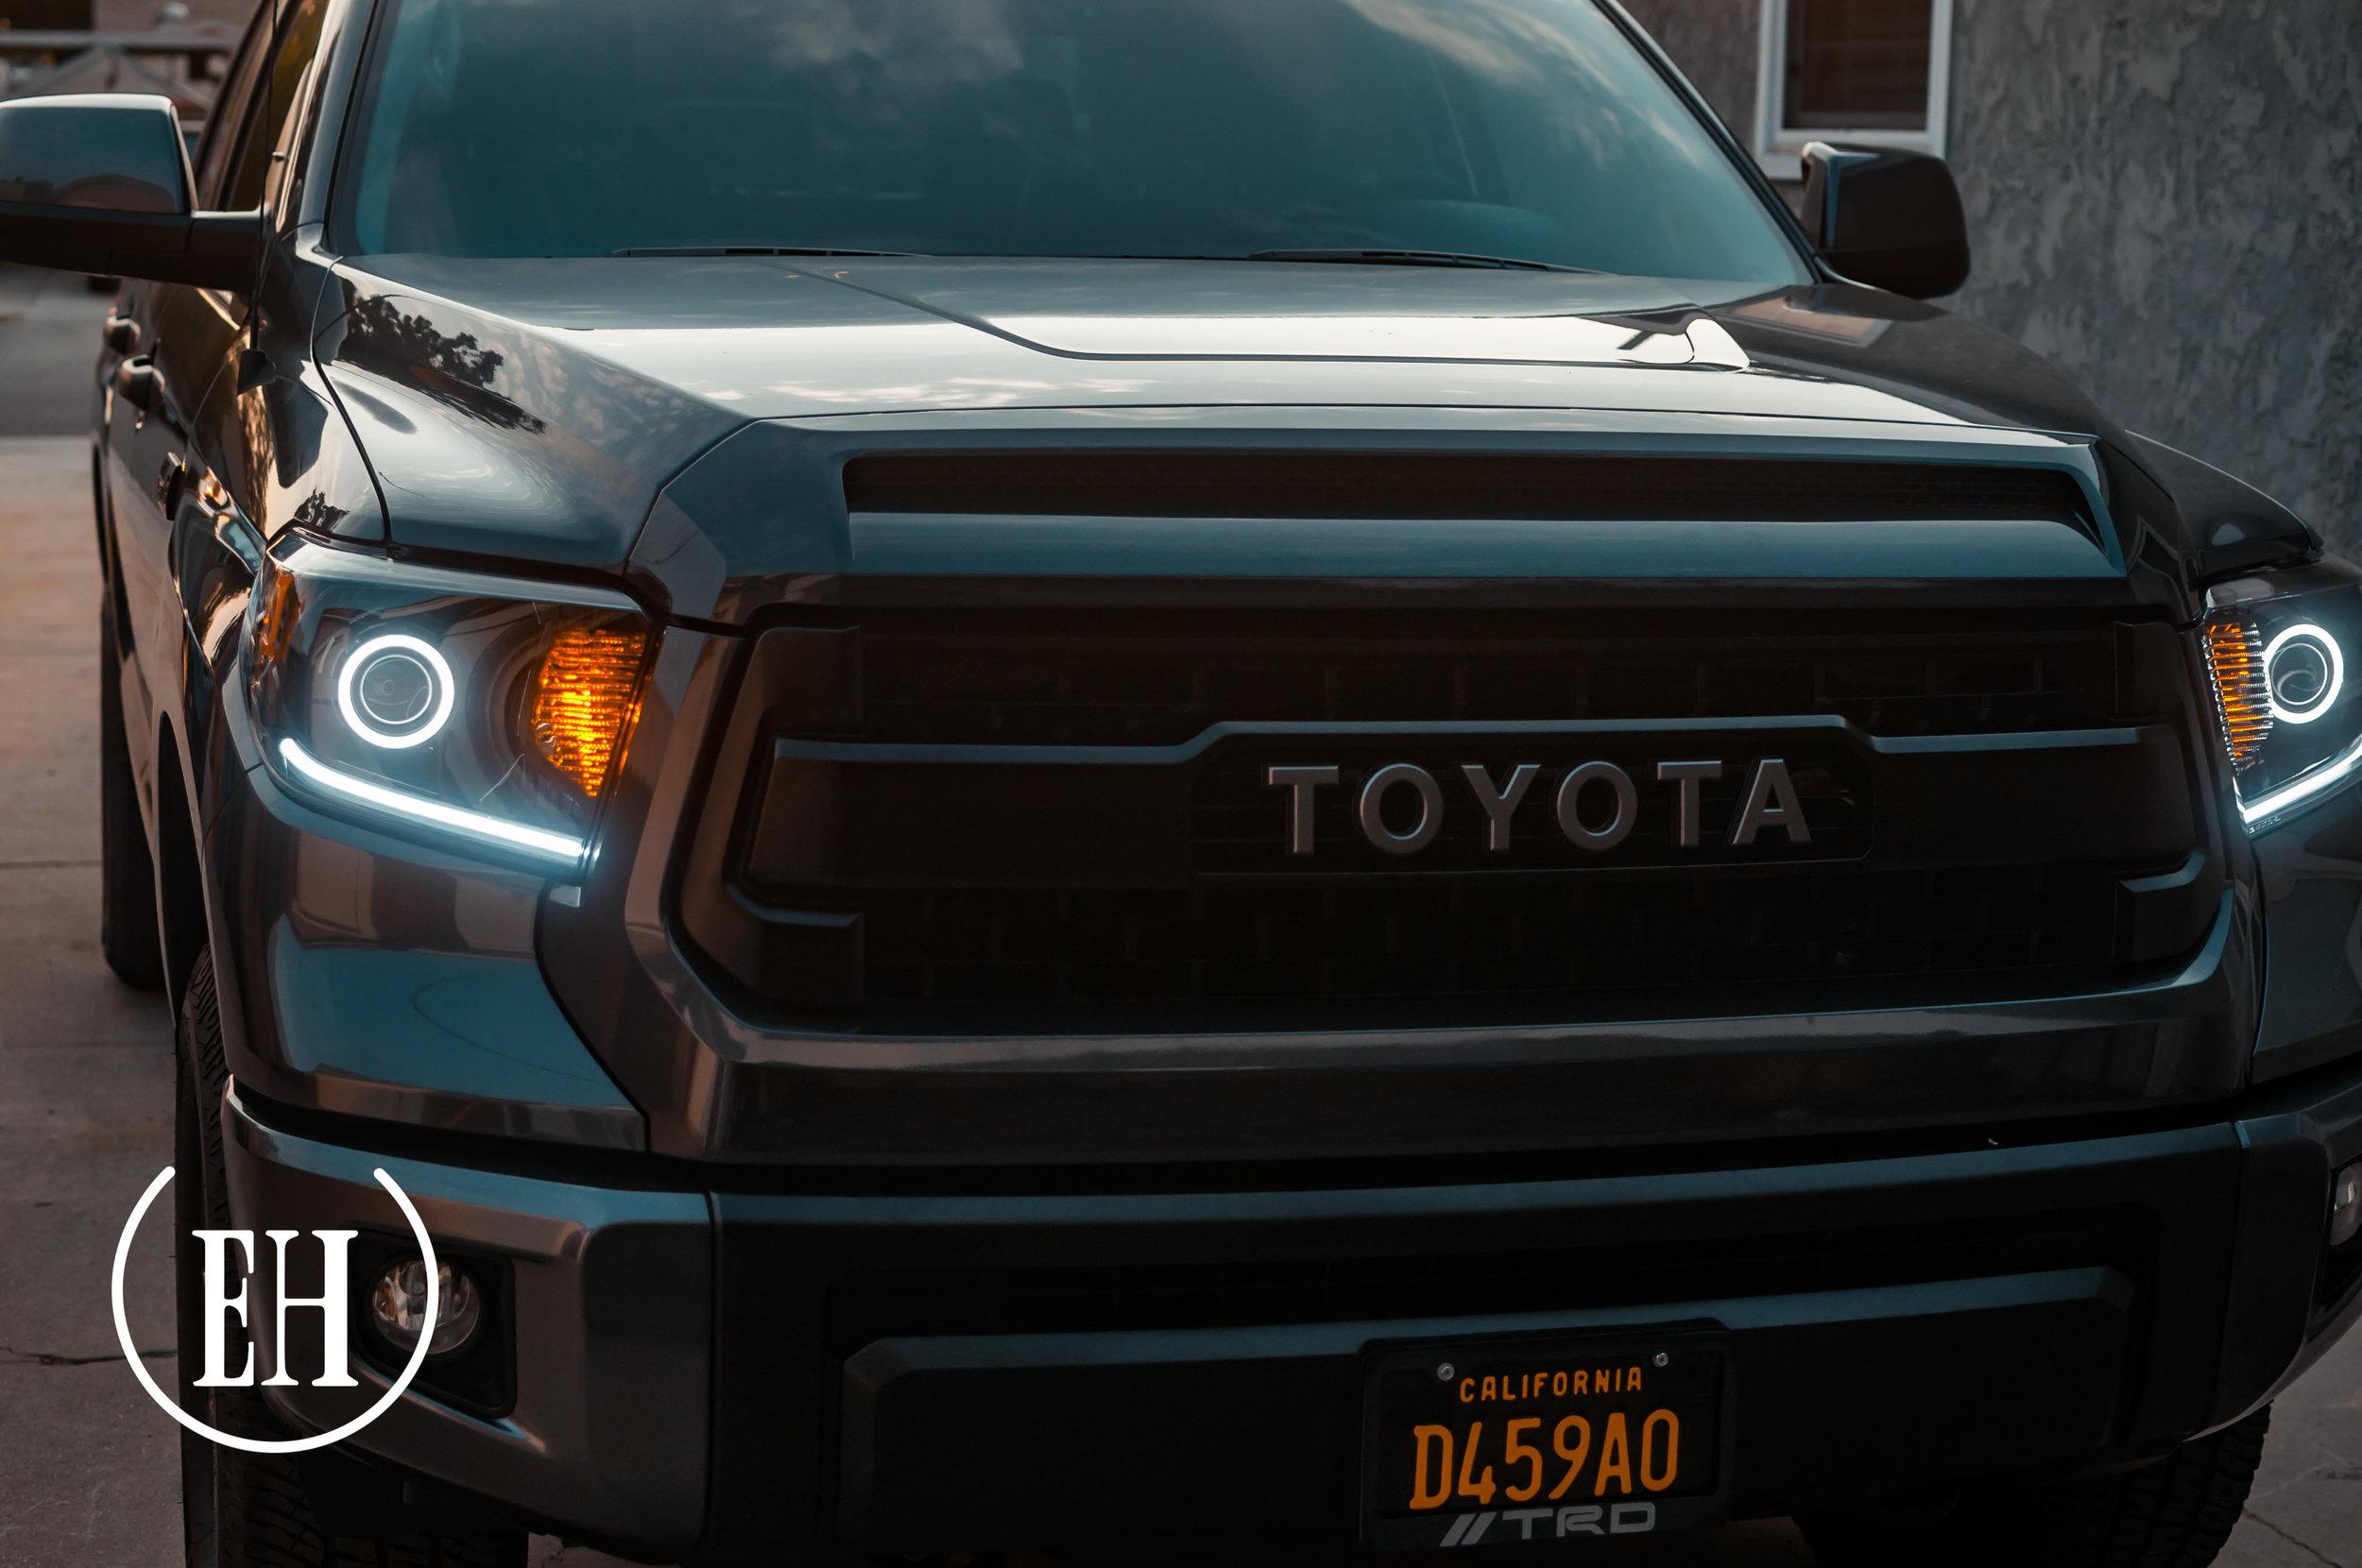 Toyota Tundra Gallery Evil Headlights Custom Retrofitting Service In Southern California